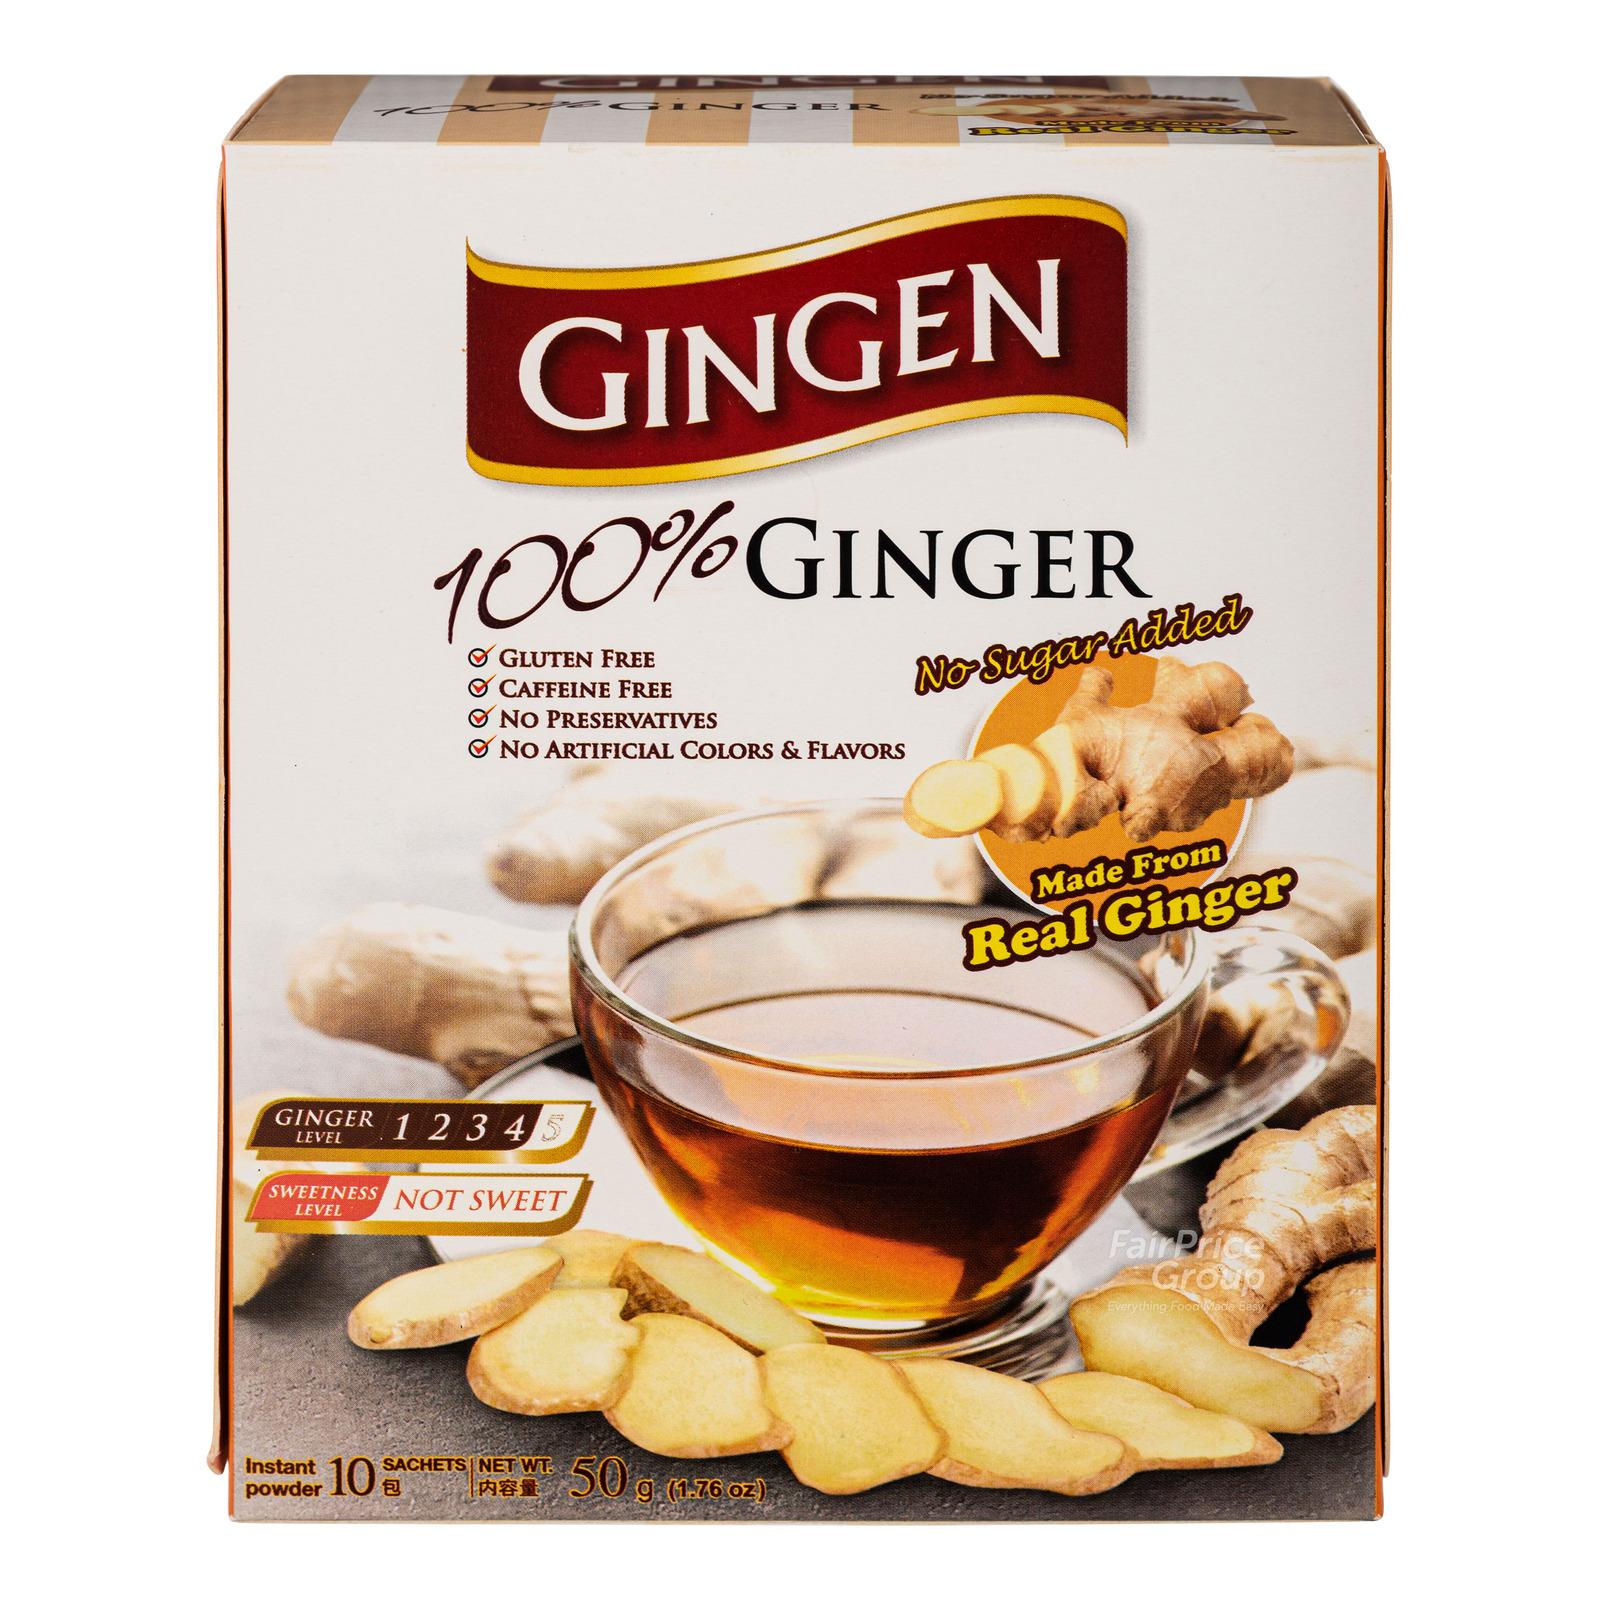 Gingen Instant Ginger Powder - Original (No Sugar)